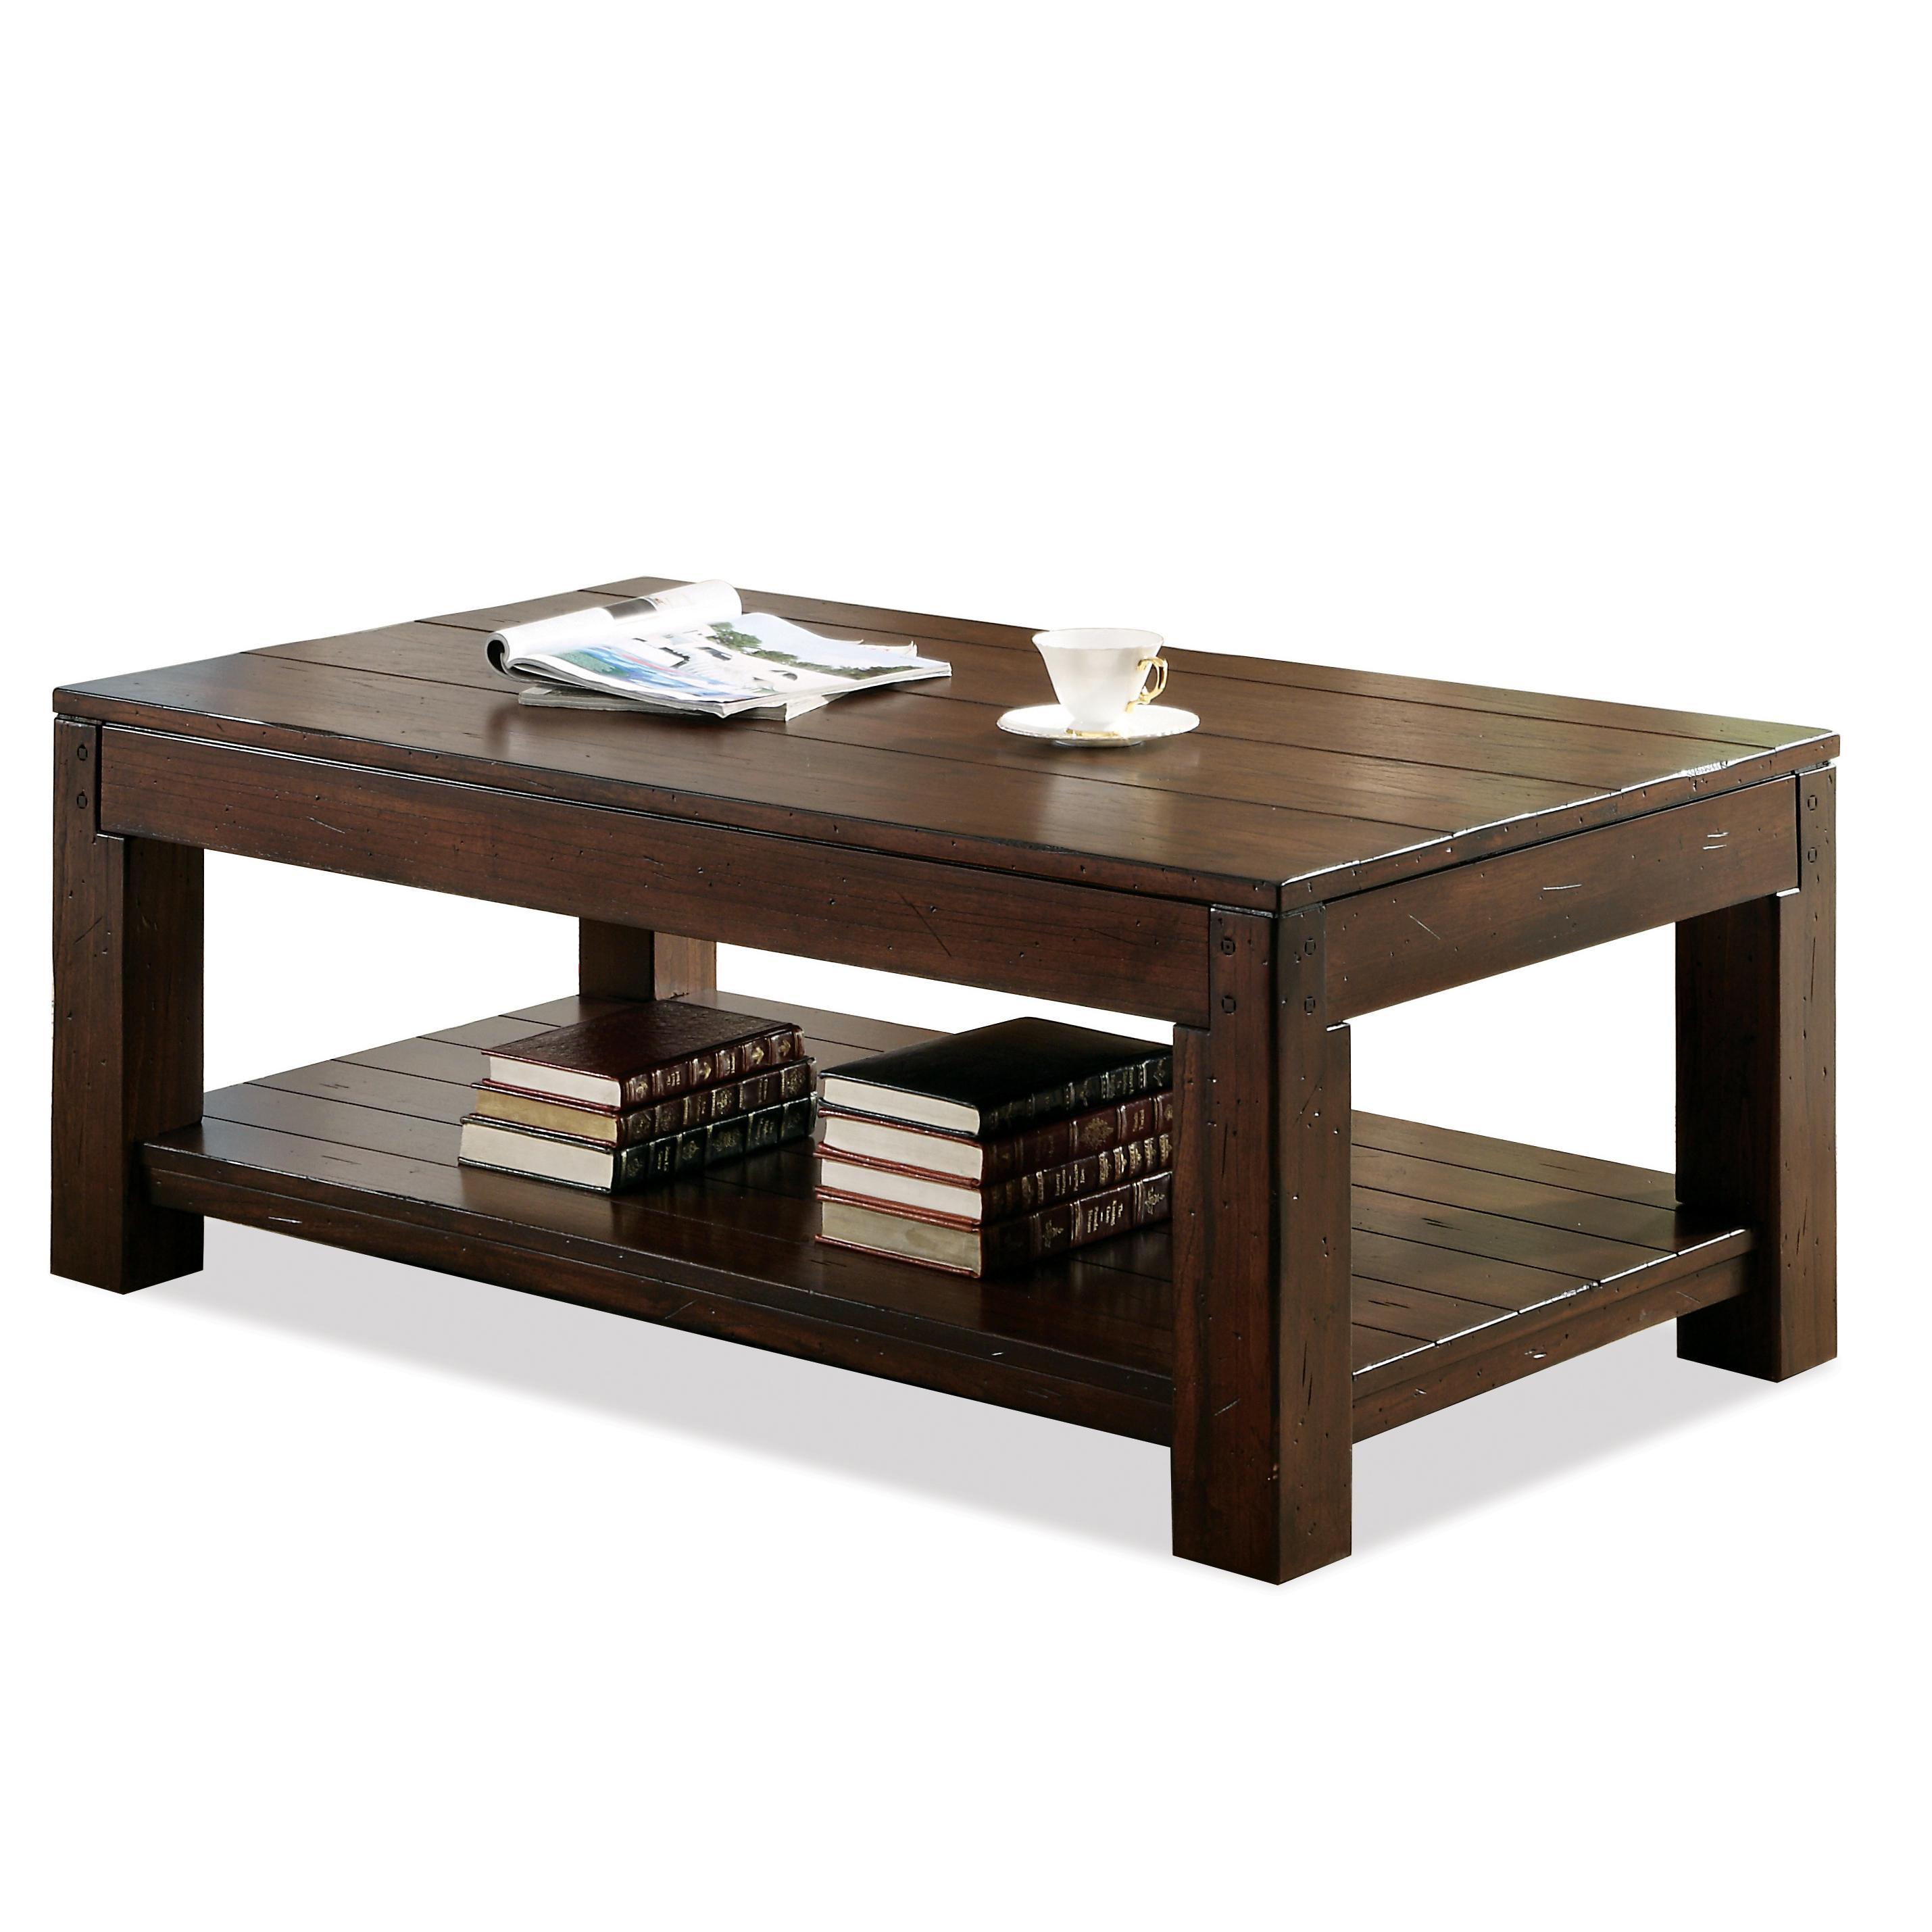 Riverside Furniture Castlewood Coffee Table - Item Number: 335-02